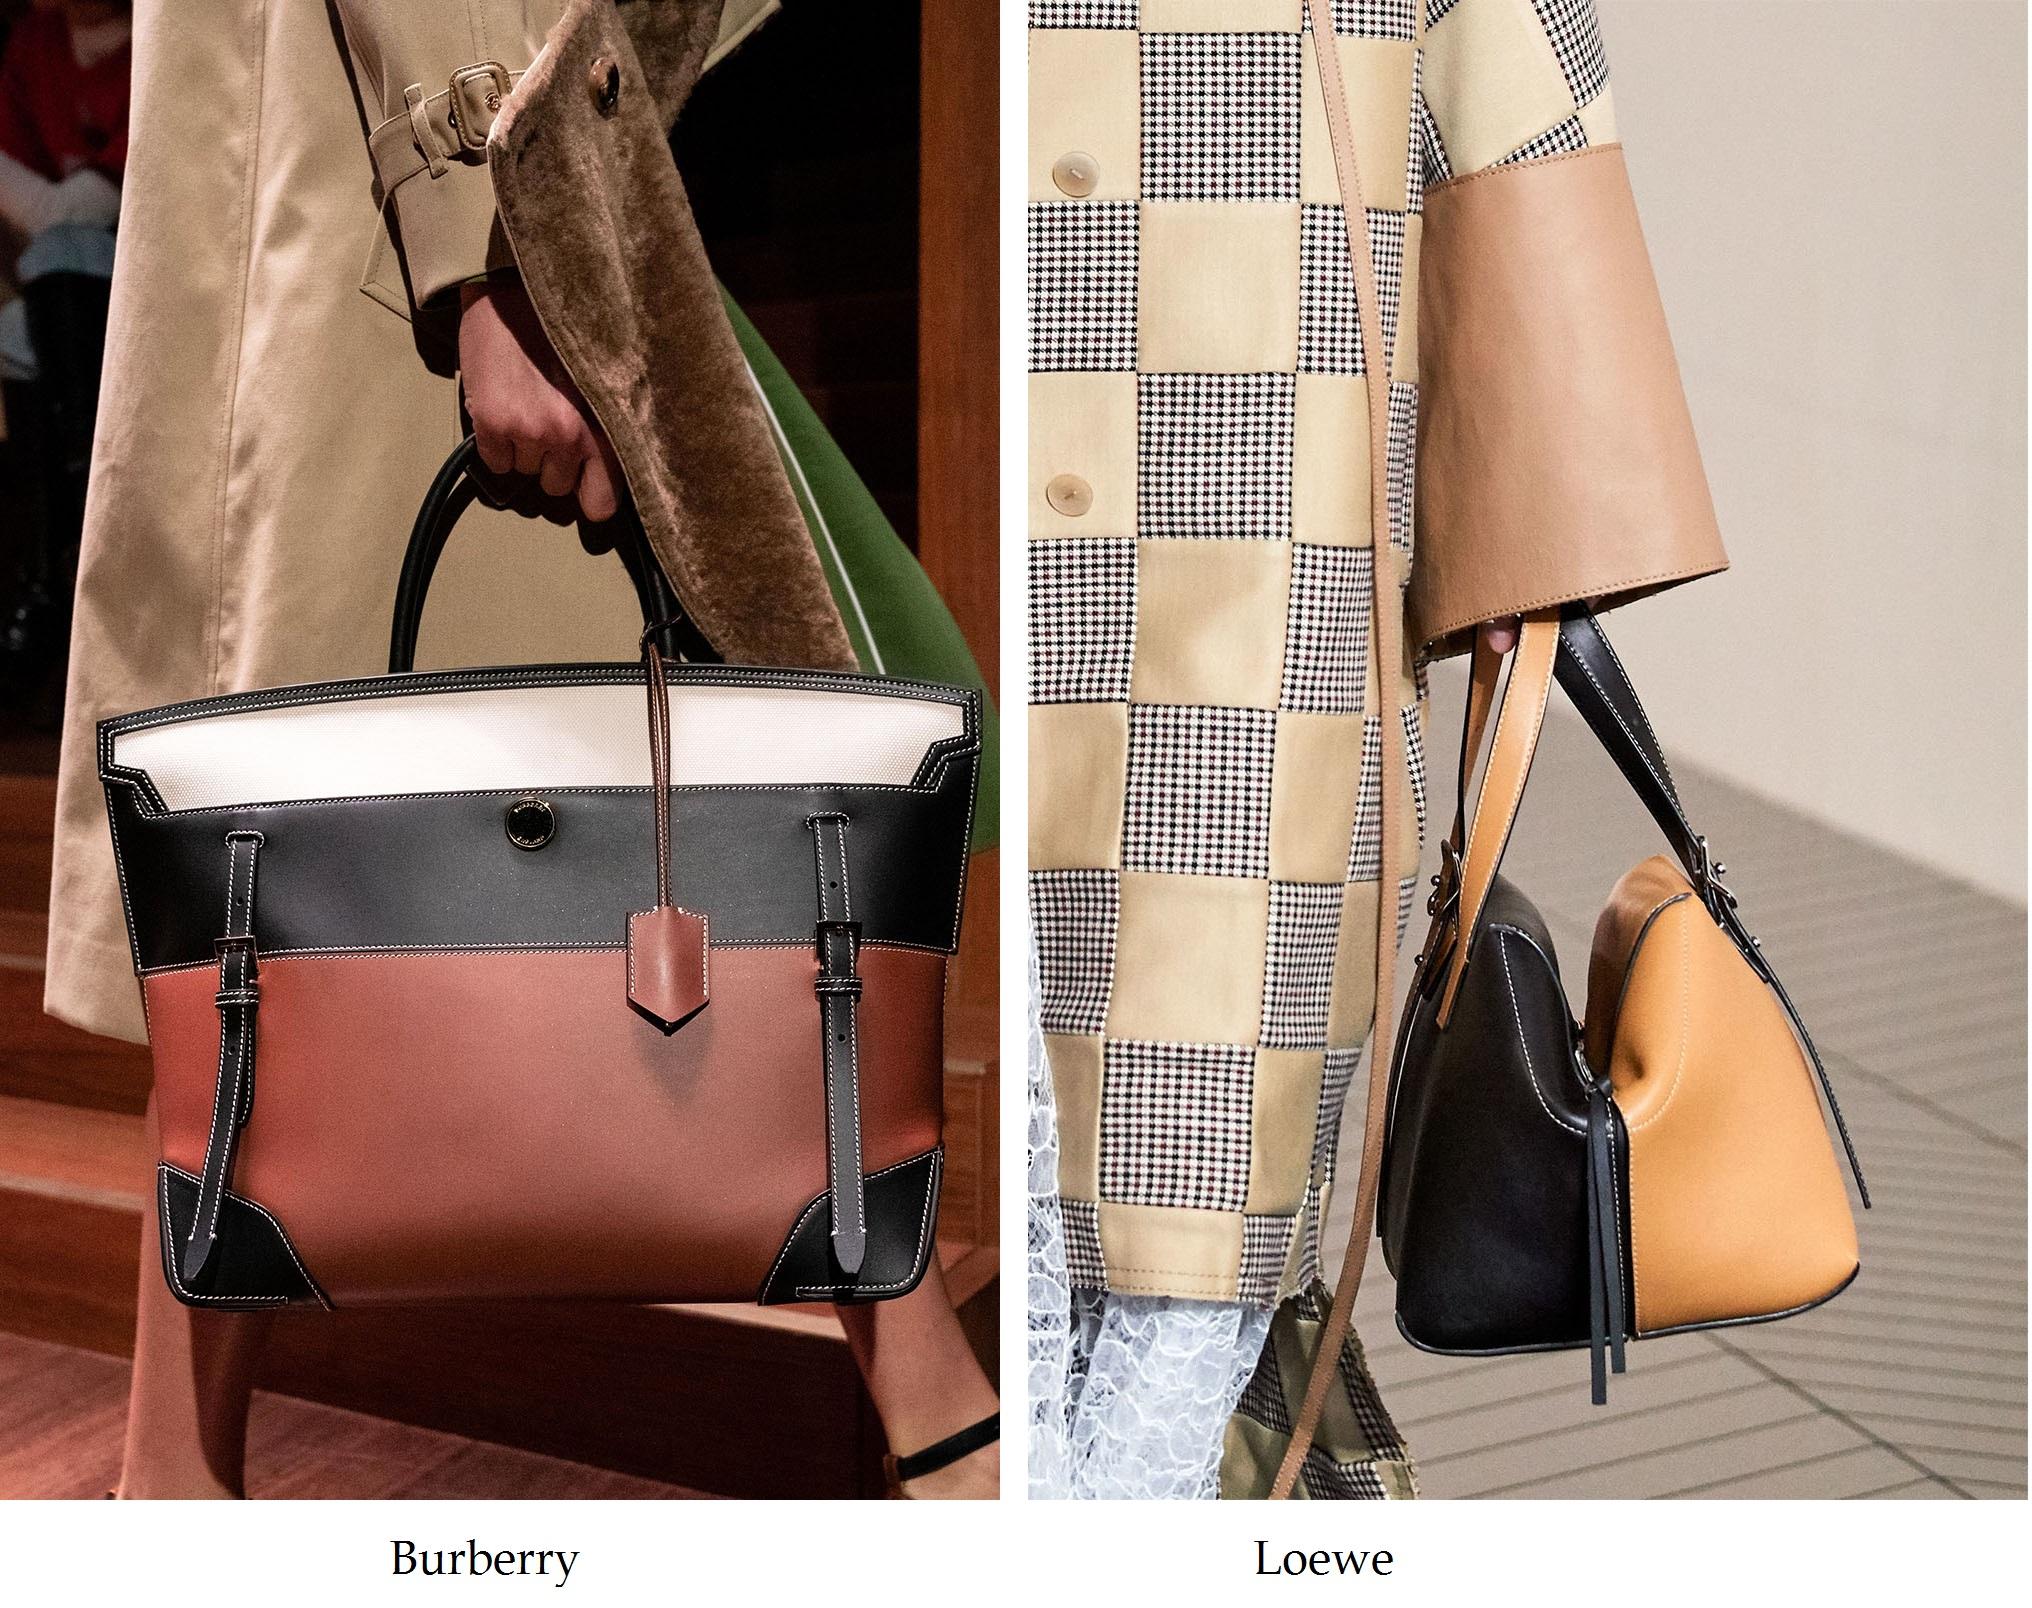 fashion-handbag-5-beautysummary.com-5